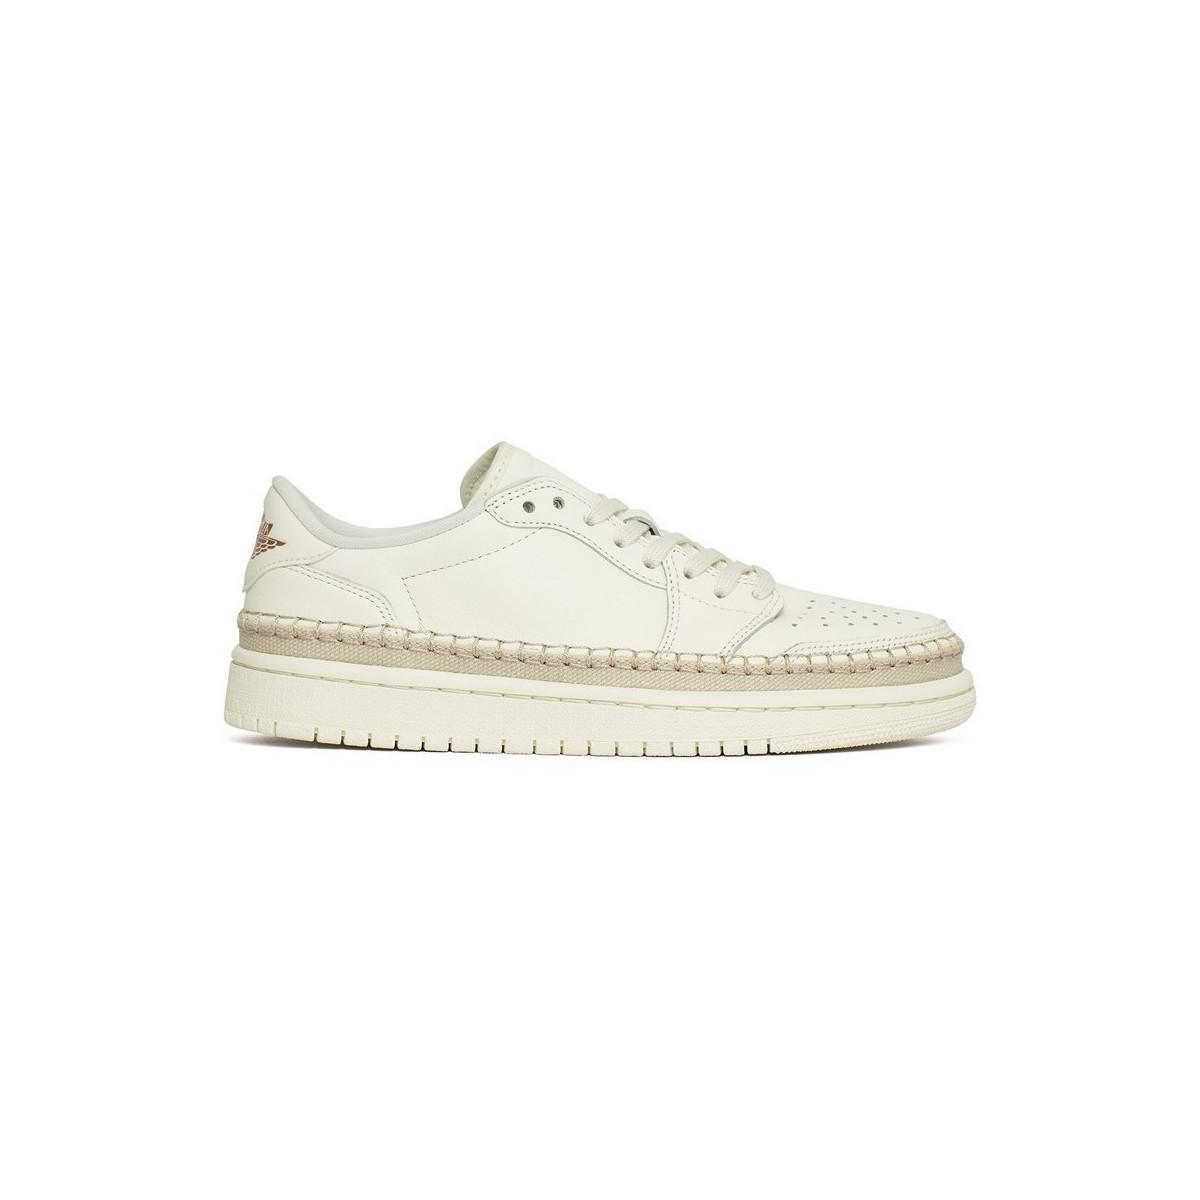 meet 785d1 db775 Nike Wmns Air Jordan 1 Retro Low Ns Women s Shoes (trainers) In ...